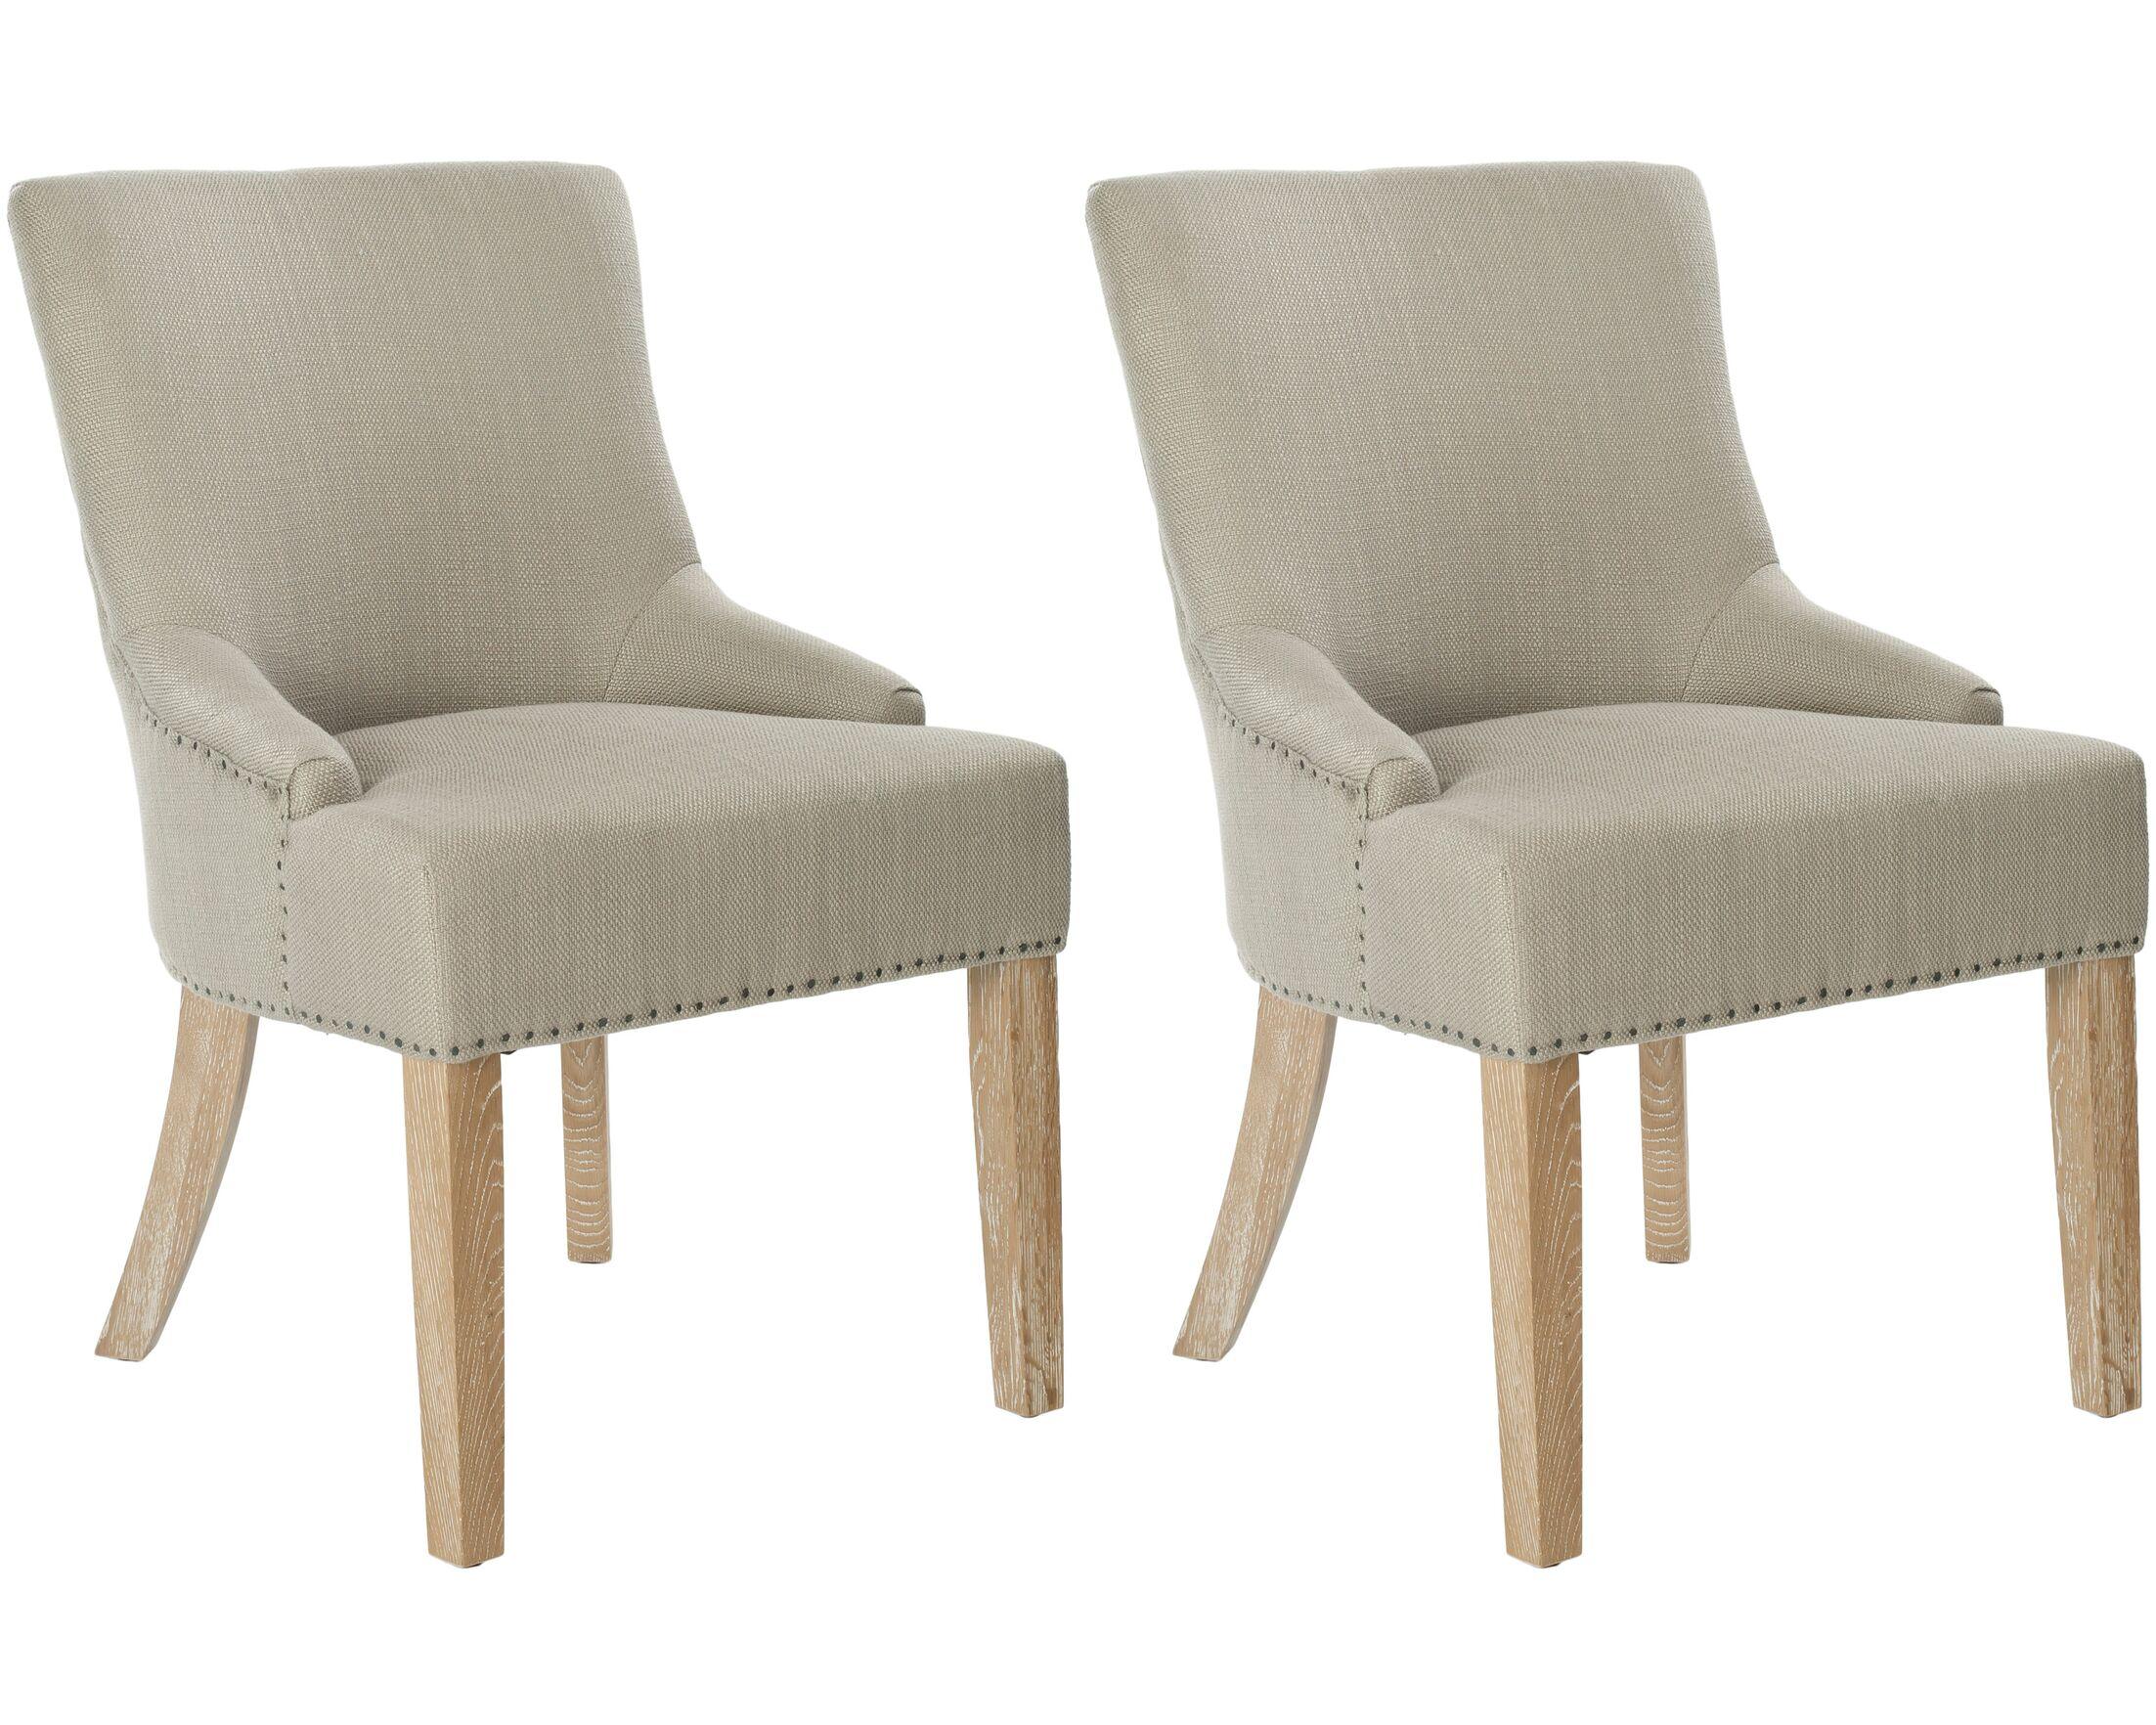 York Upholstered Dining Chair Upholstery Color: Biscuit Beige, Leg Color: Pickled Oak